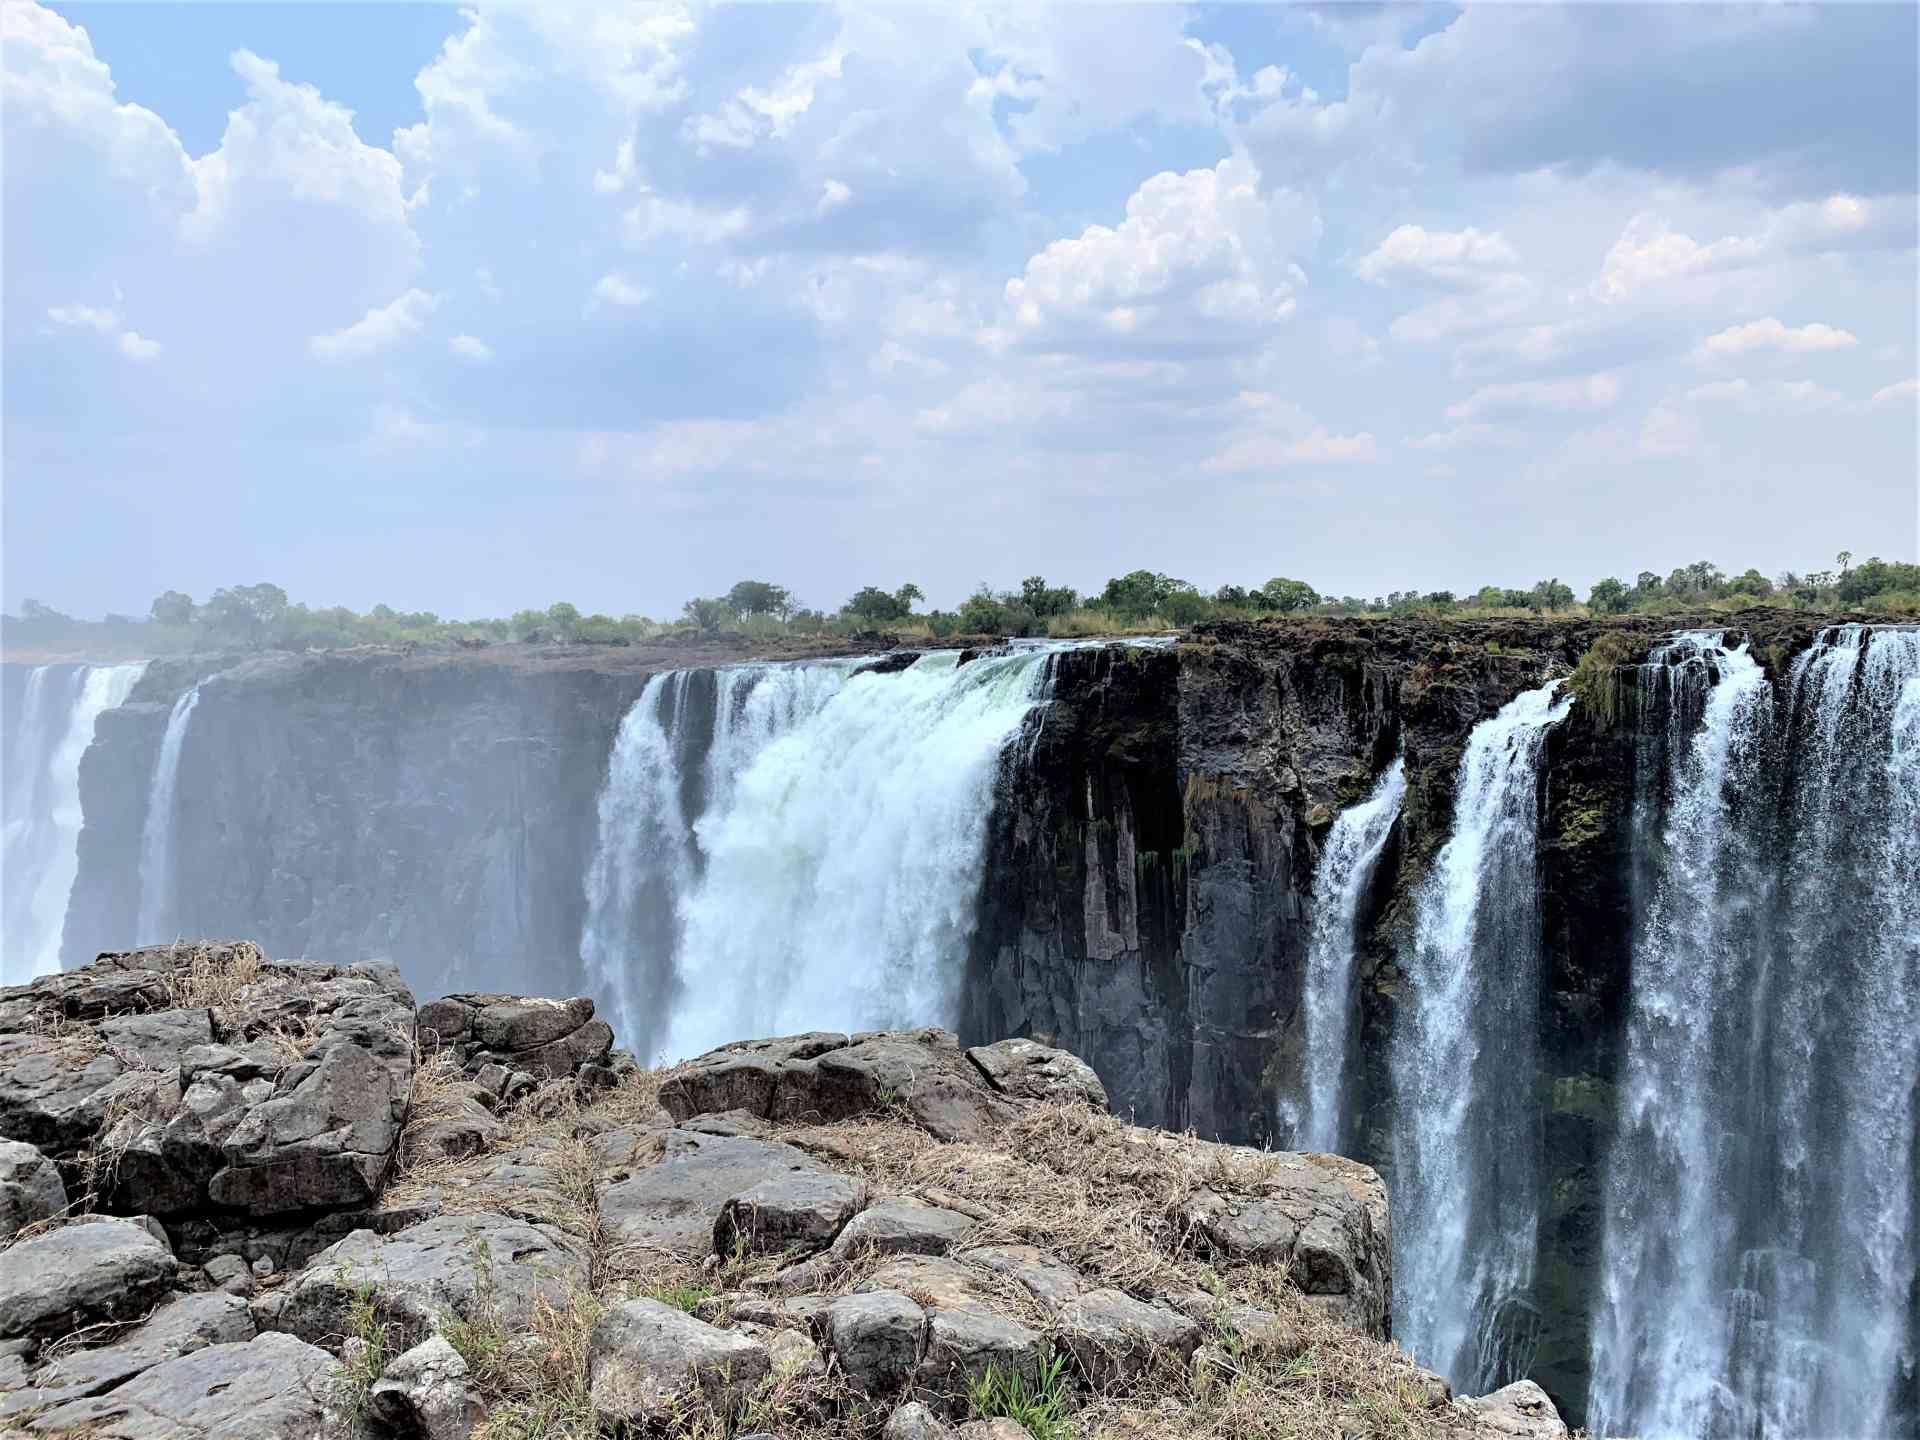 Thunderous waterfalls